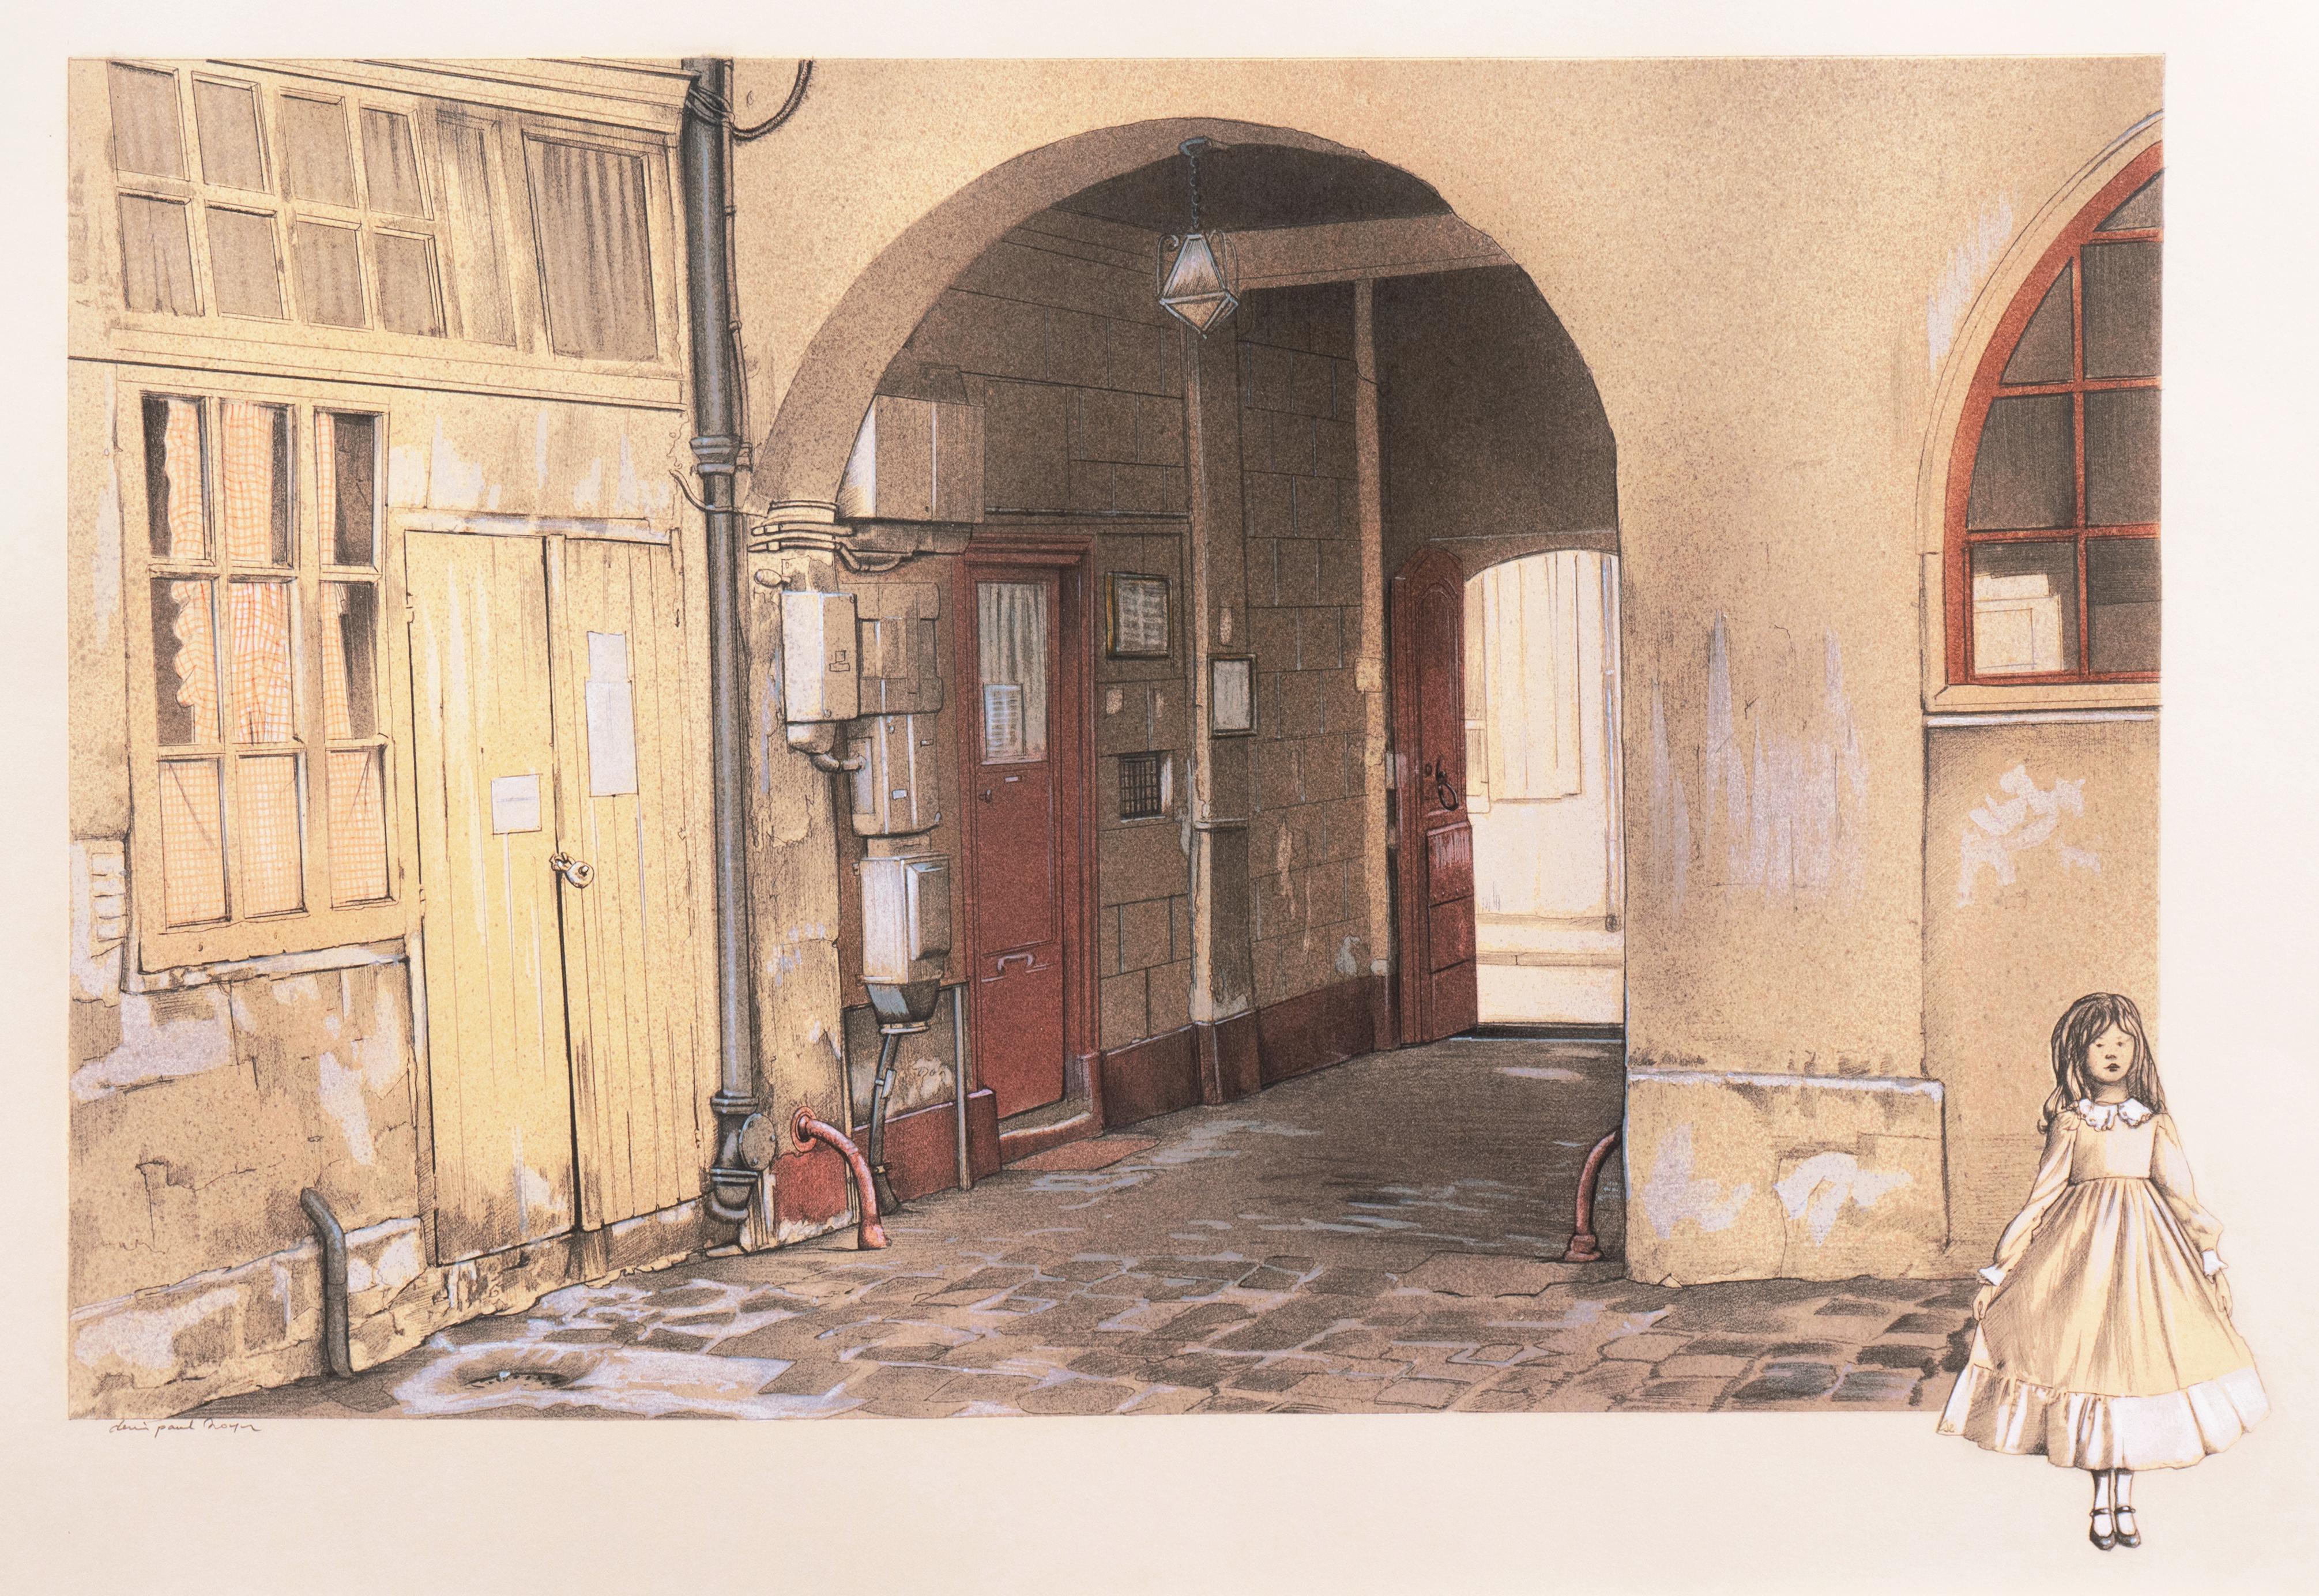 'French Courtyard', Large School of Paris Drawing, Ecole des Beaux Arts, Lyon